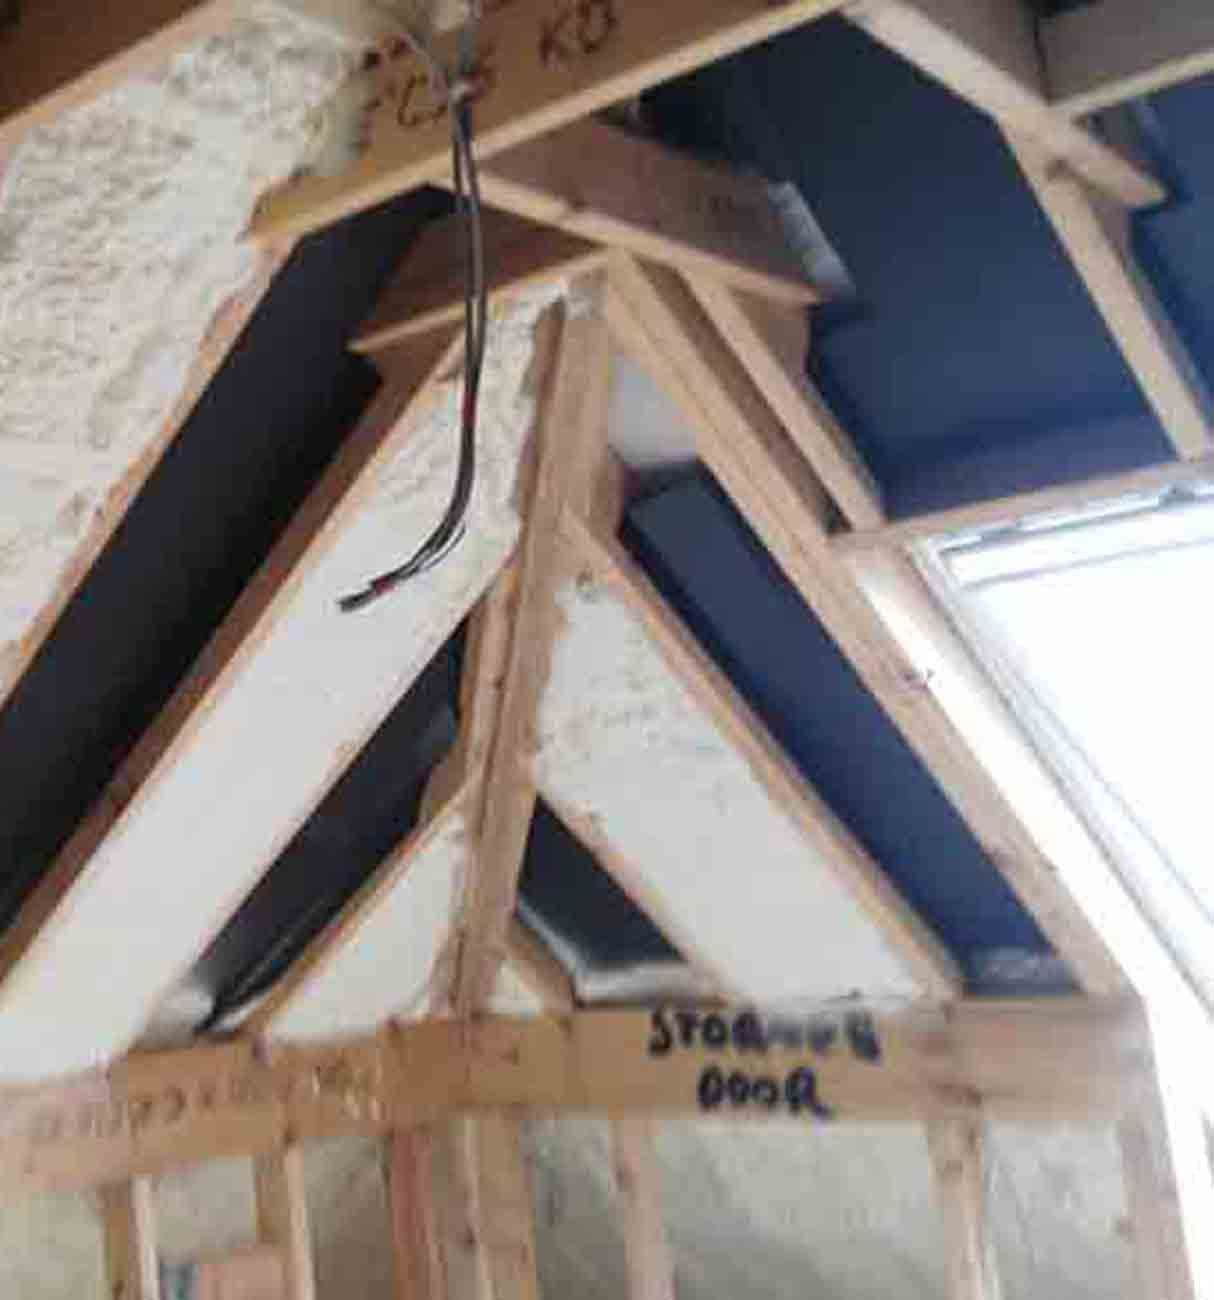 Foam On Vent Card Attic Renovation Attic Insulation Attic Flooring